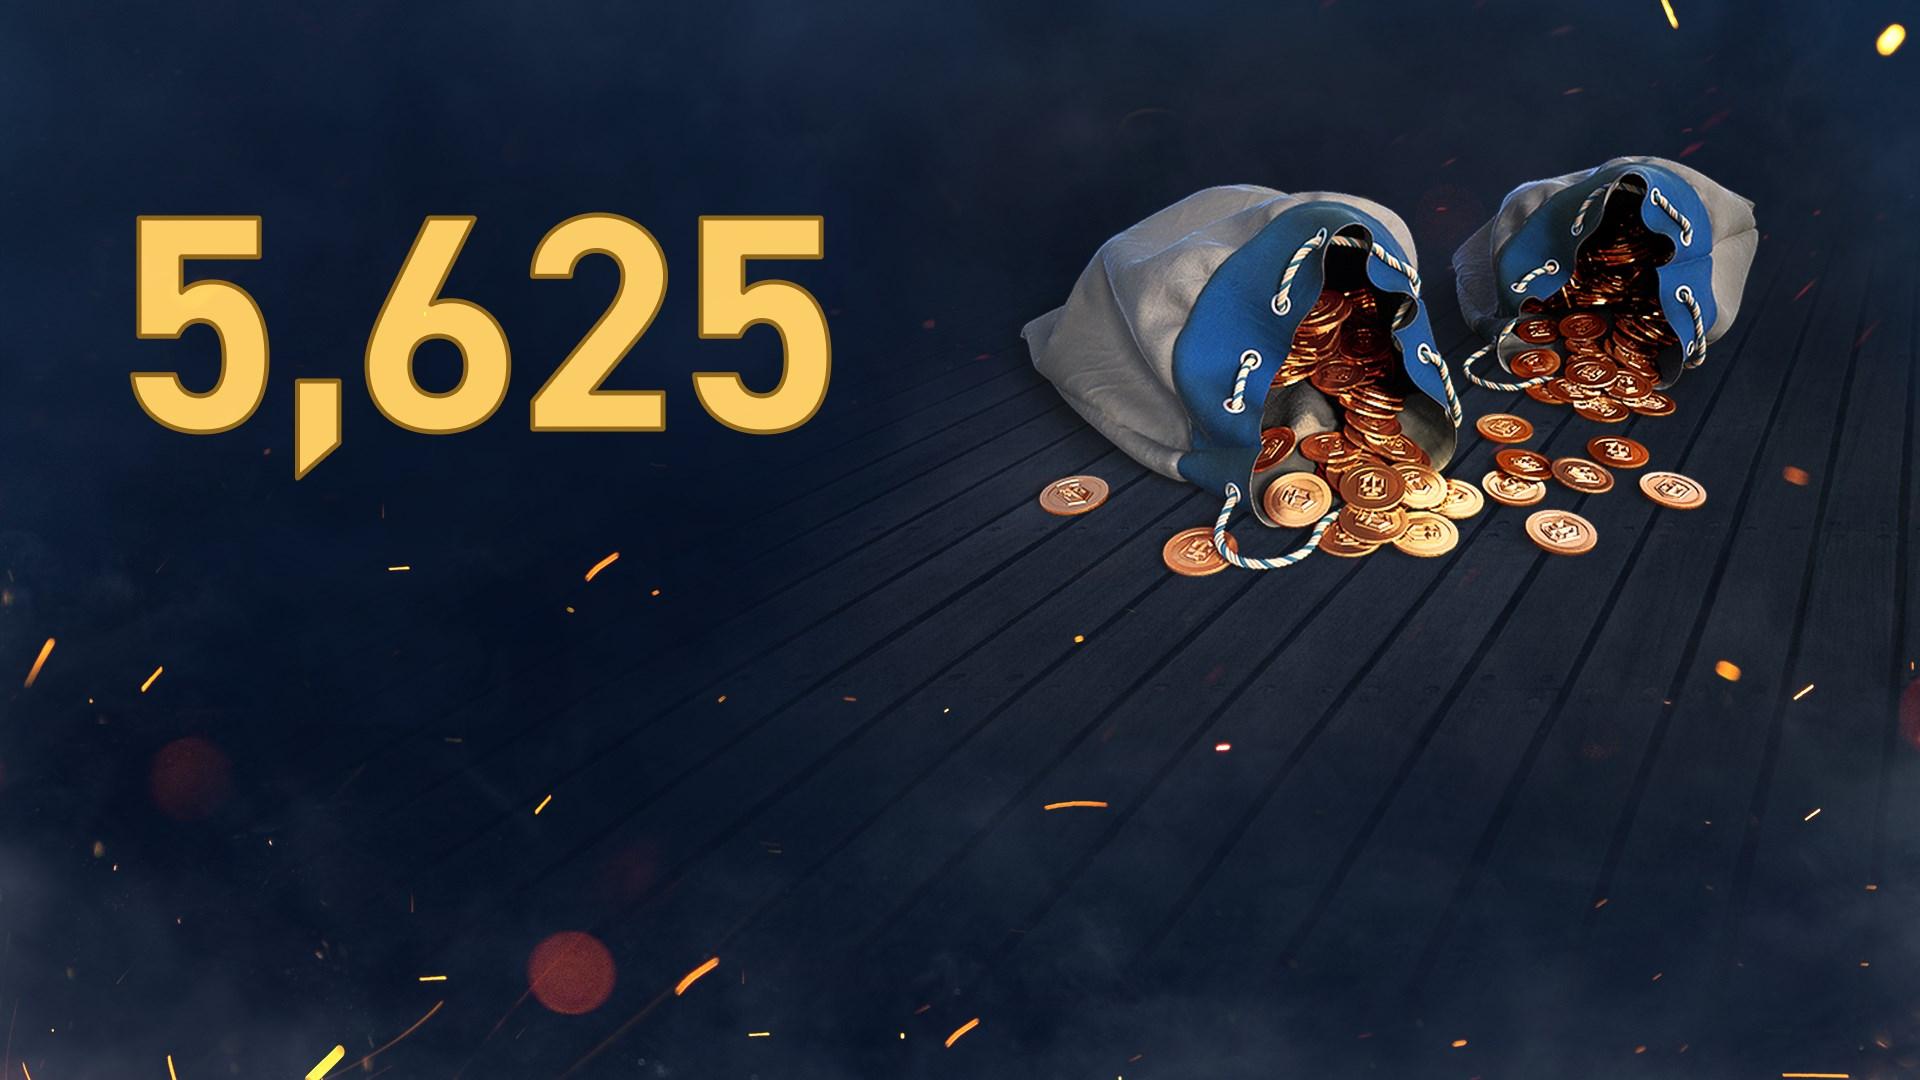 World of Warships: leyendas, 5625 doblones